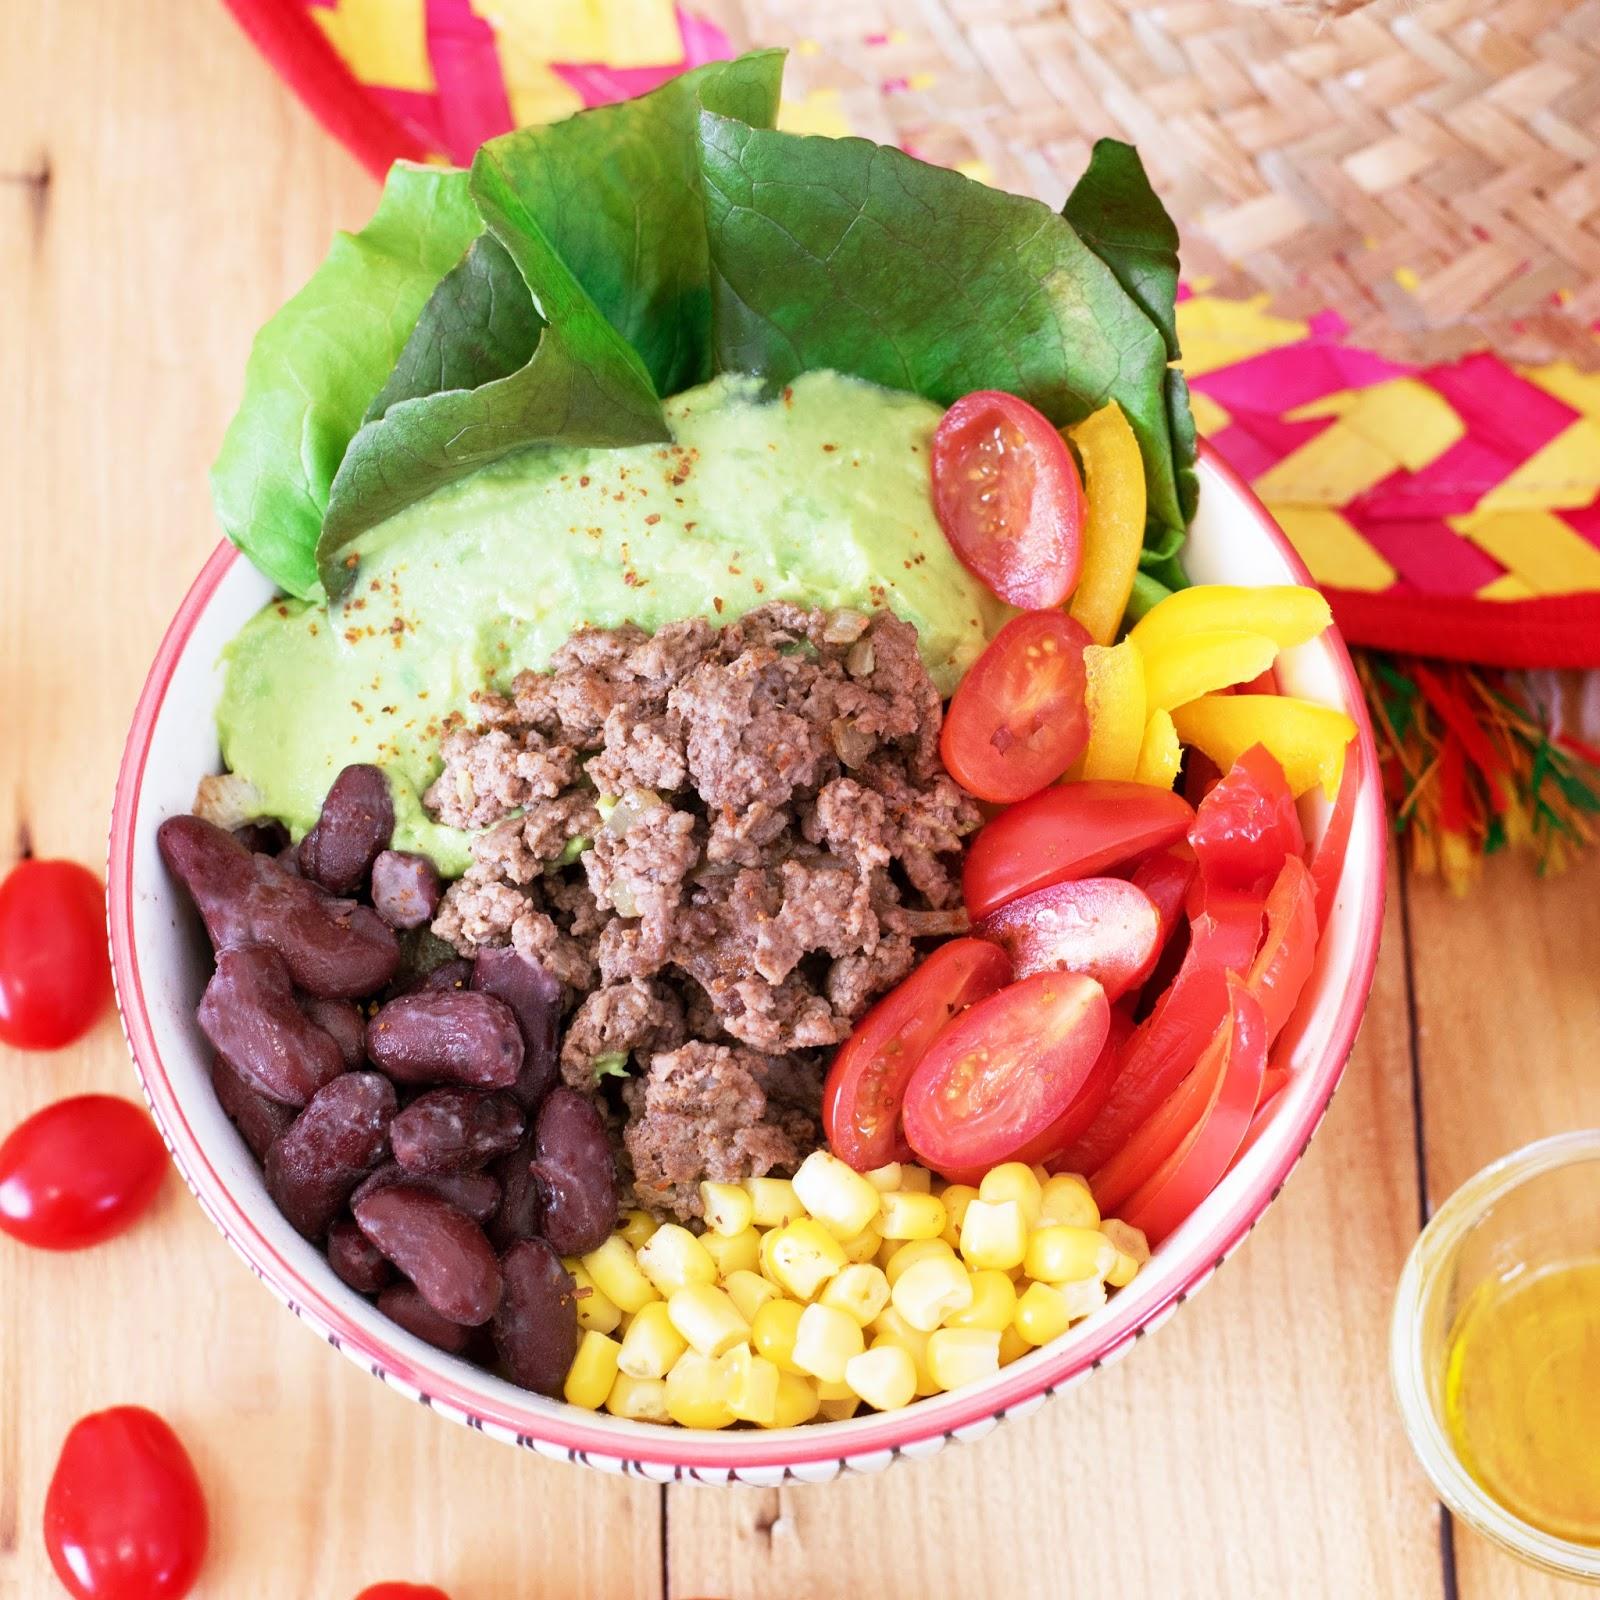 recette Salade healthy façon chili